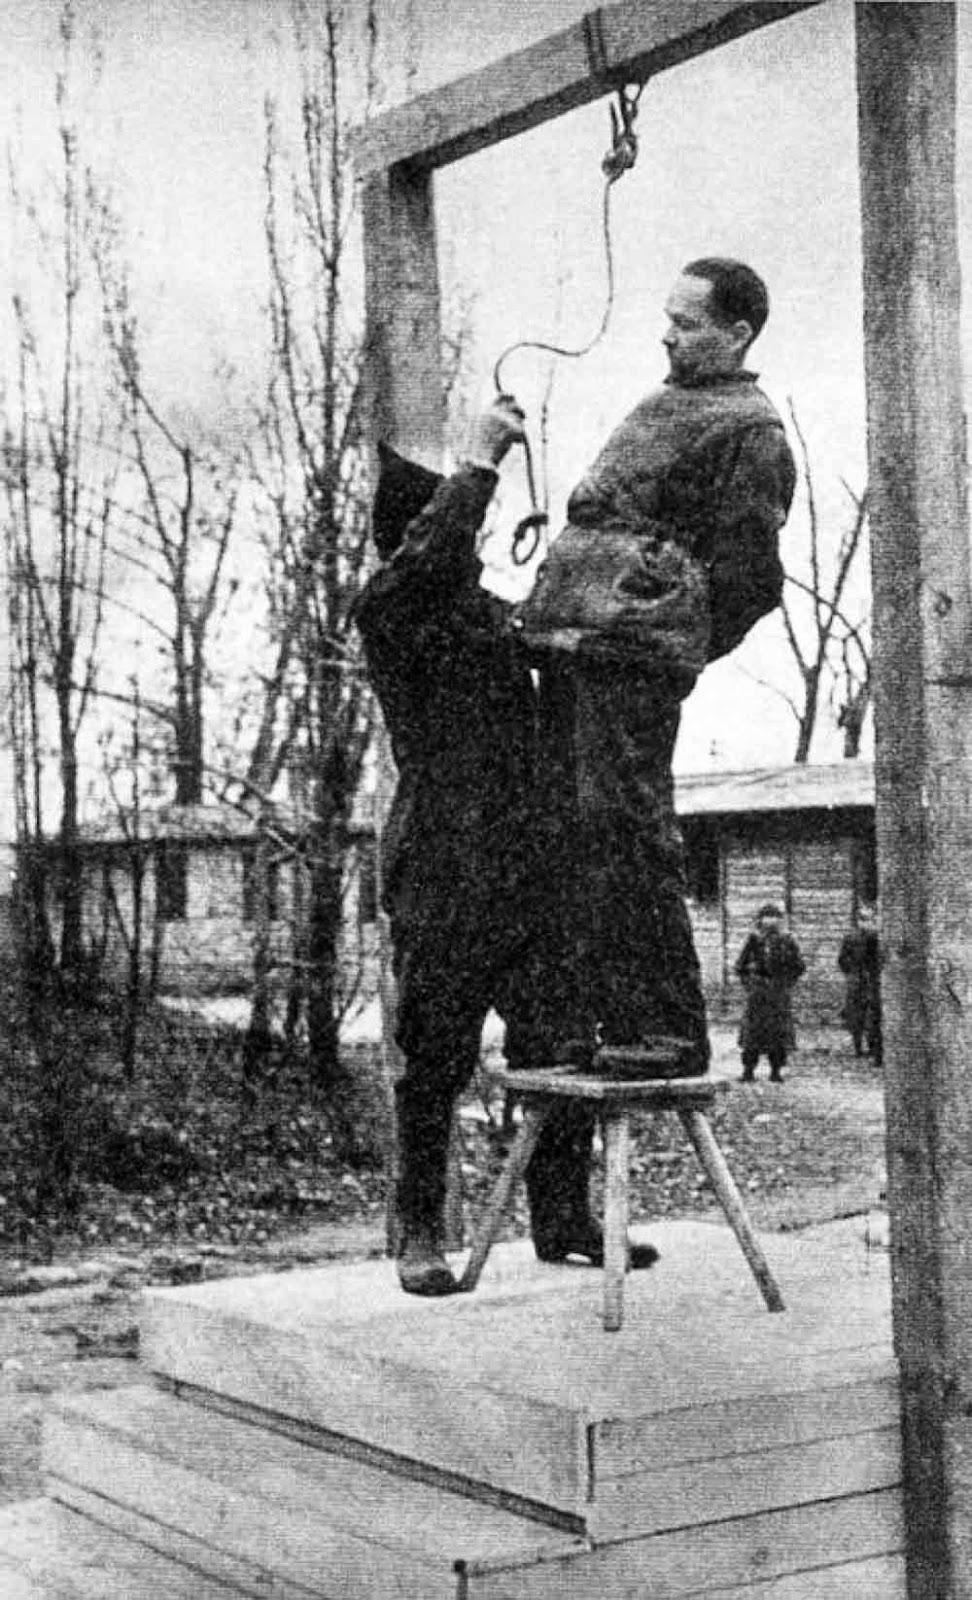 Diverses photos de la WWII - Page 2 81315